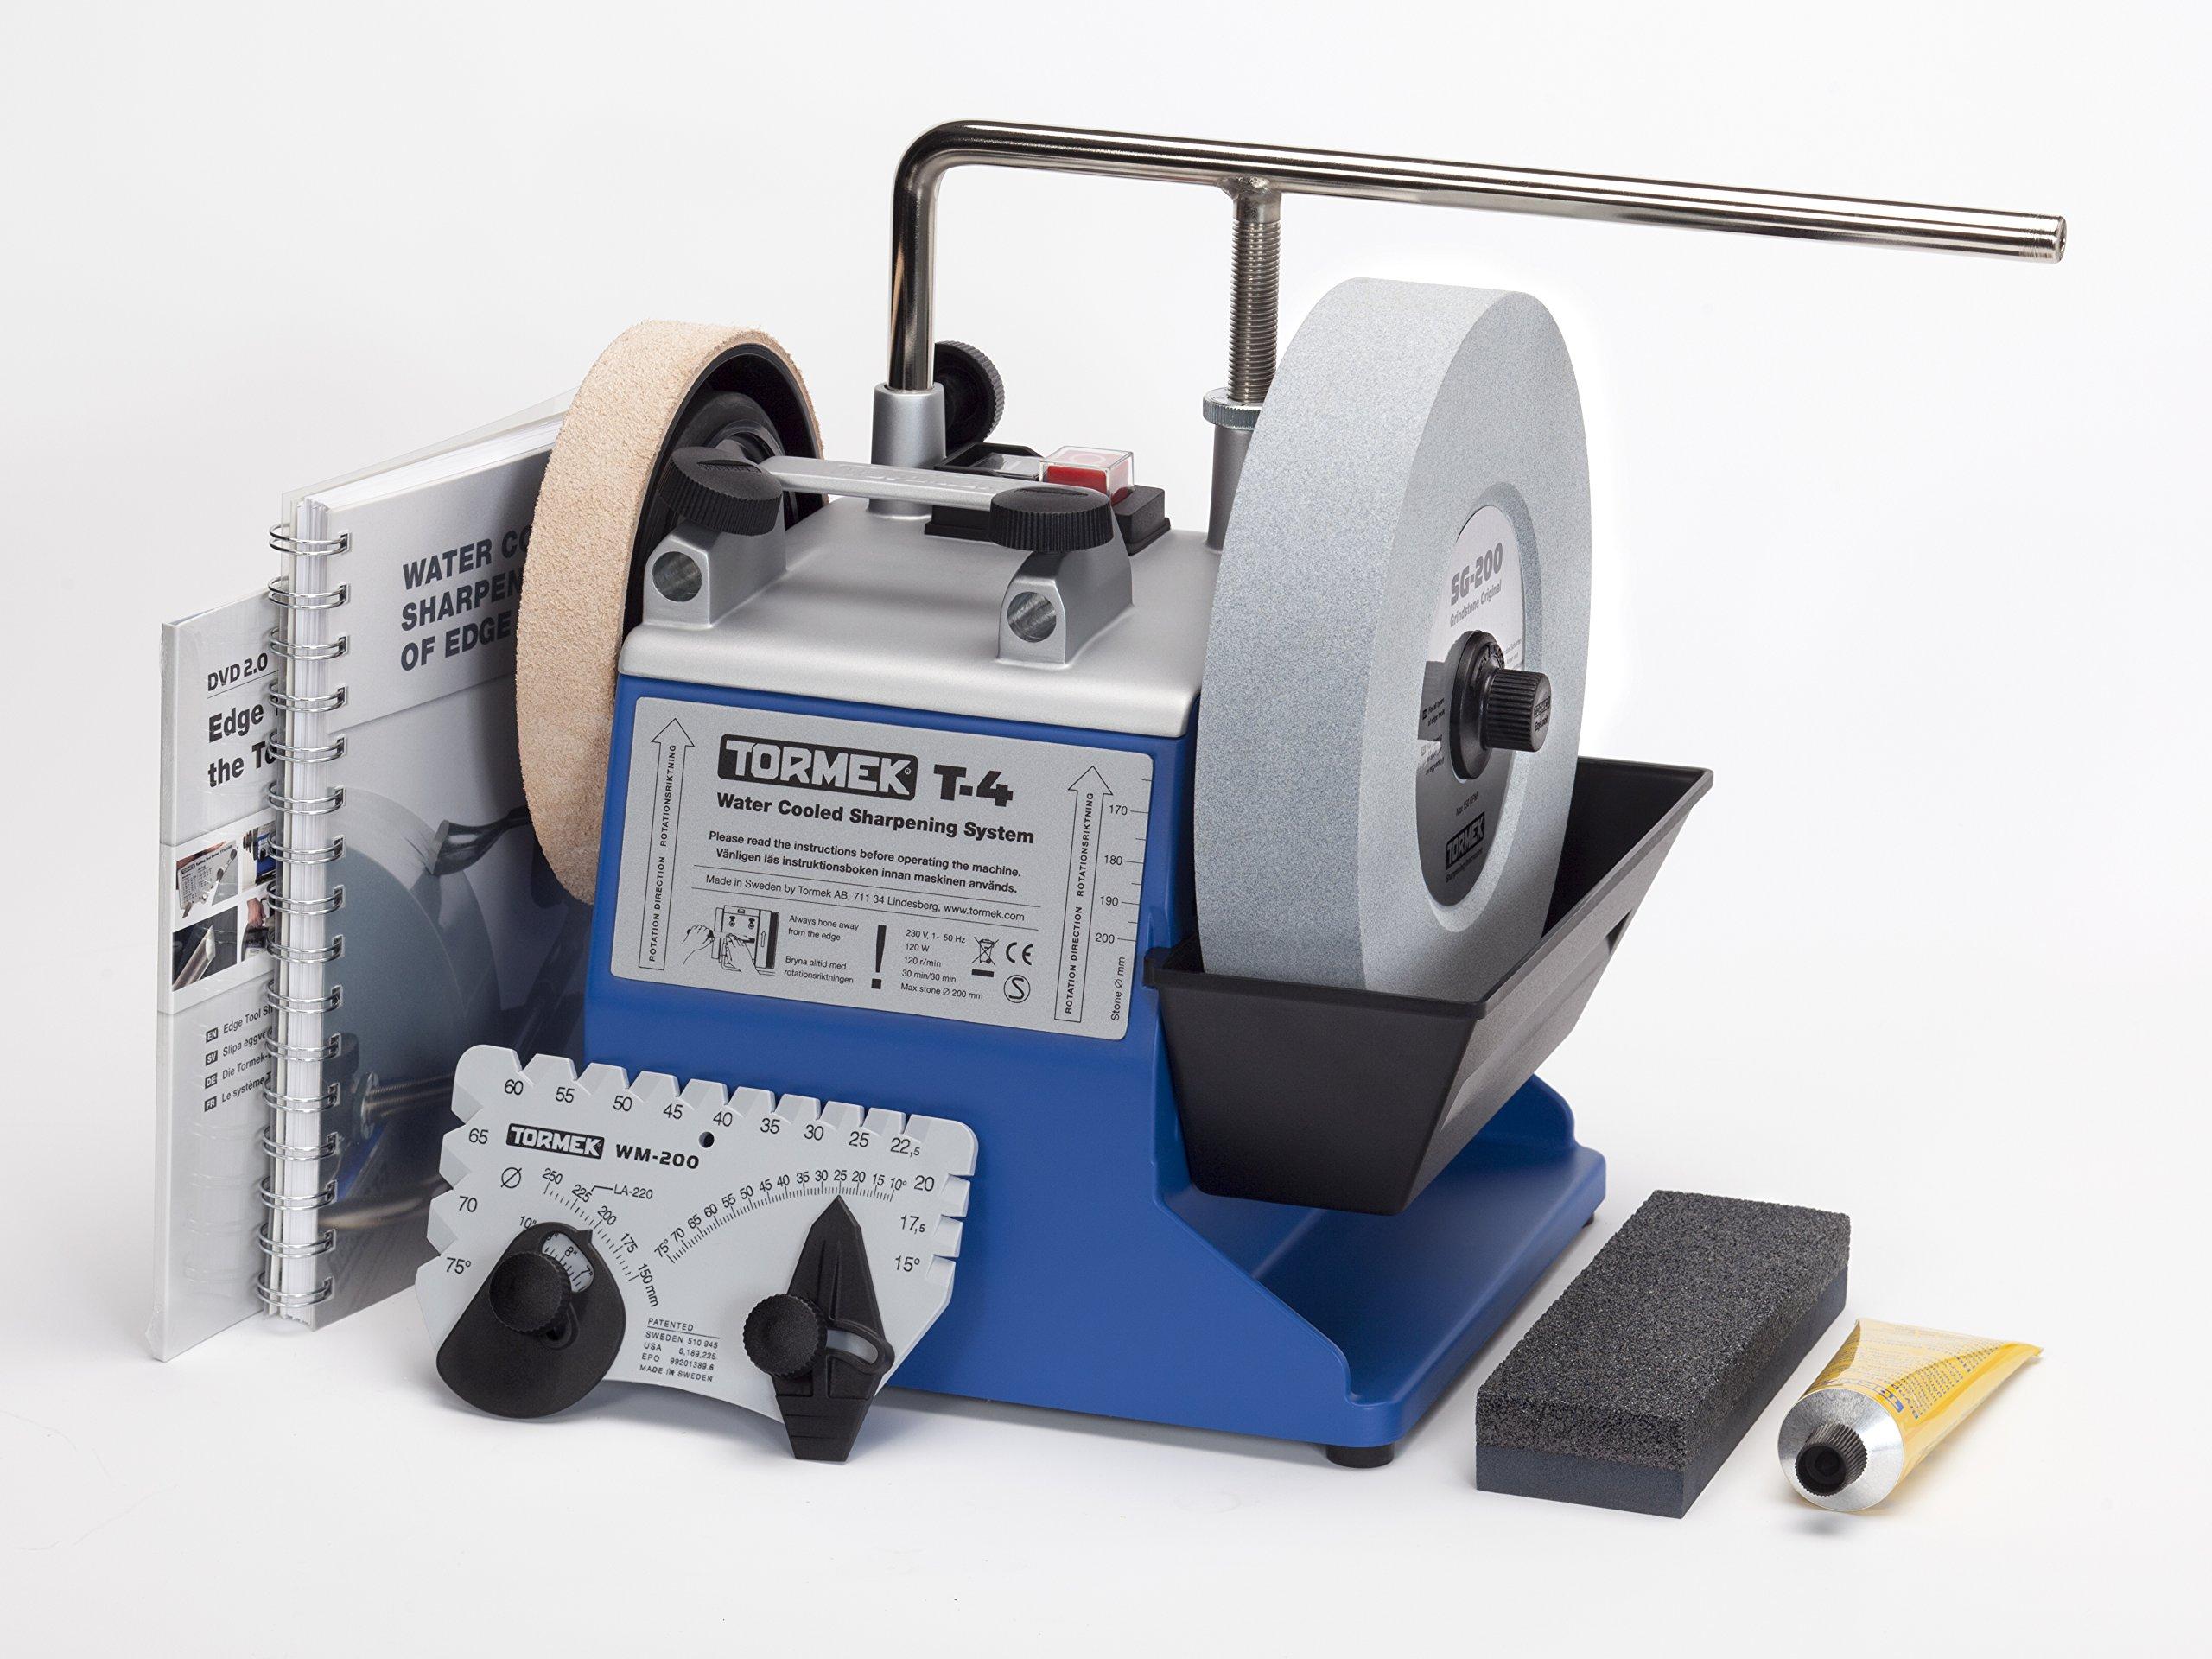 Tormek TBT403 T-4 Chefs Sharpening System